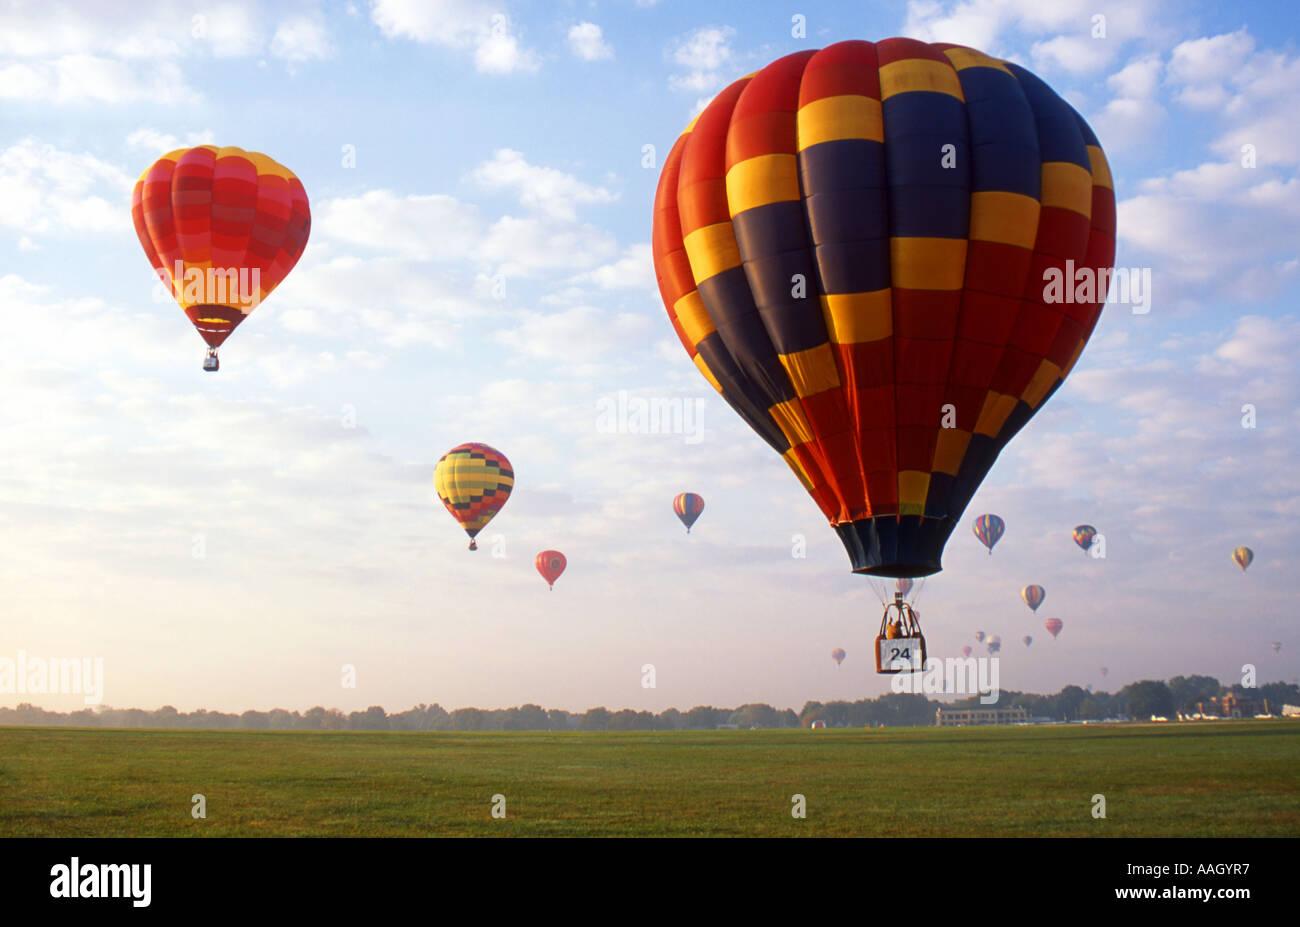 Hot Air Balloon Race Banque D'Images